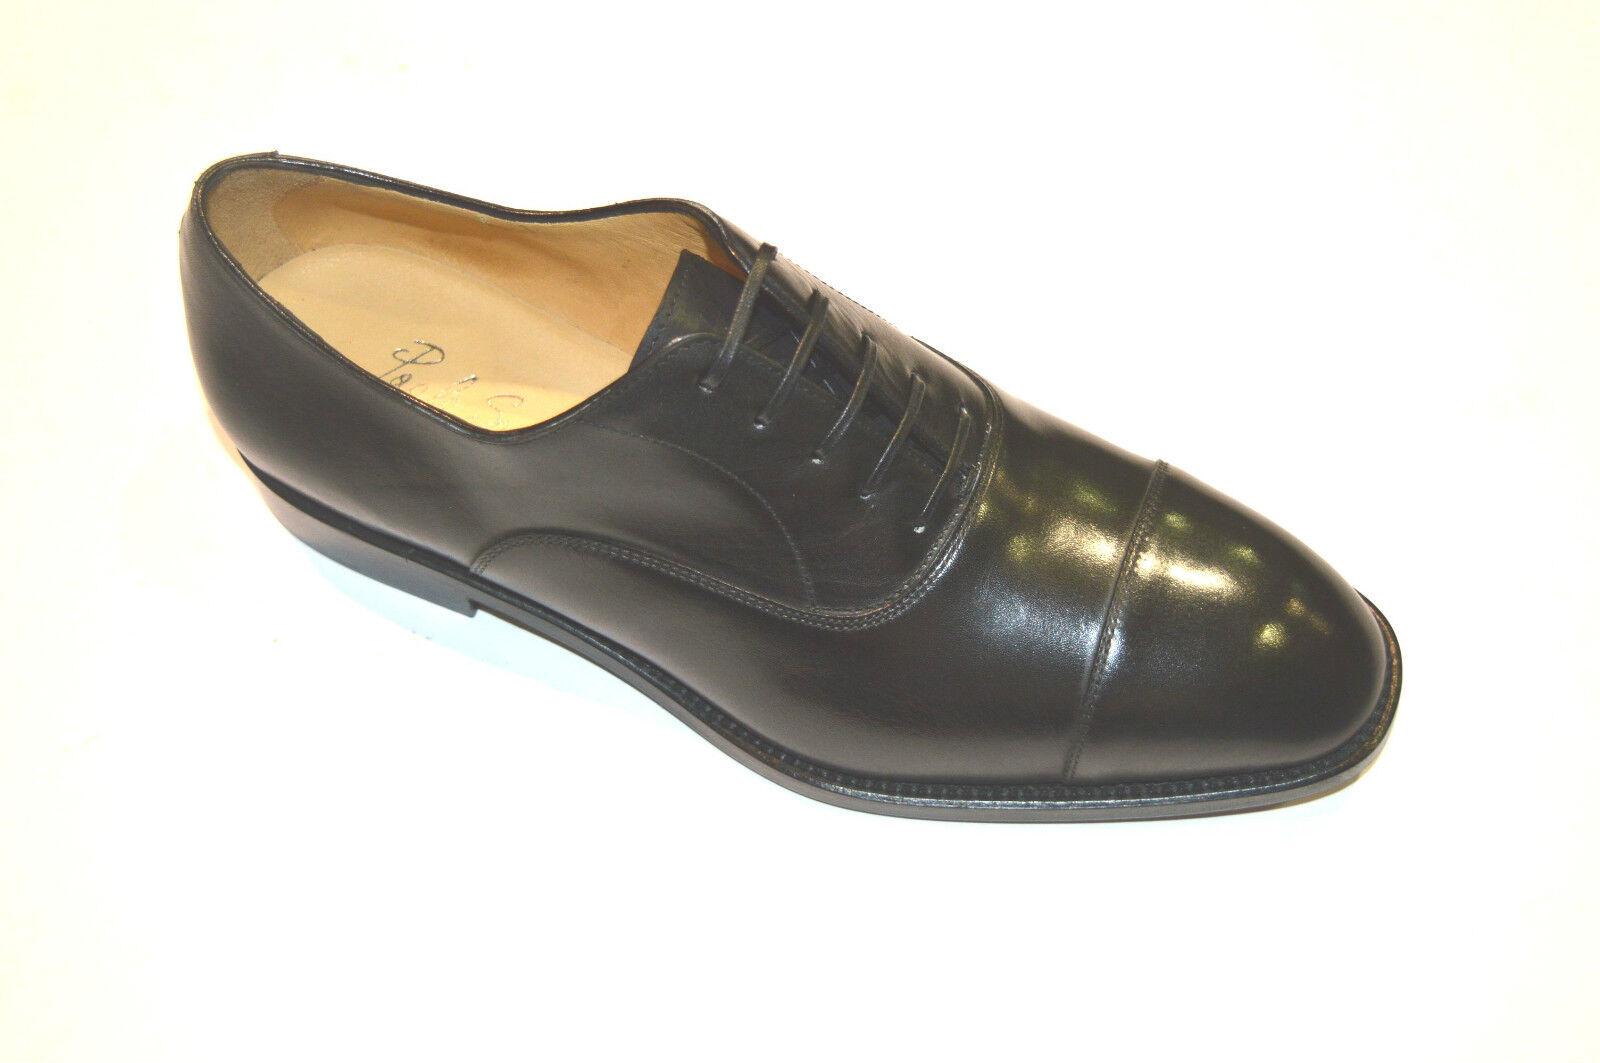 New  PAOLO SCAFORA  Dress Leather  shoes shoes shoes Size Eu 40.5 Uk 6.5 Us 7.5 (Cod 2) ca81a8